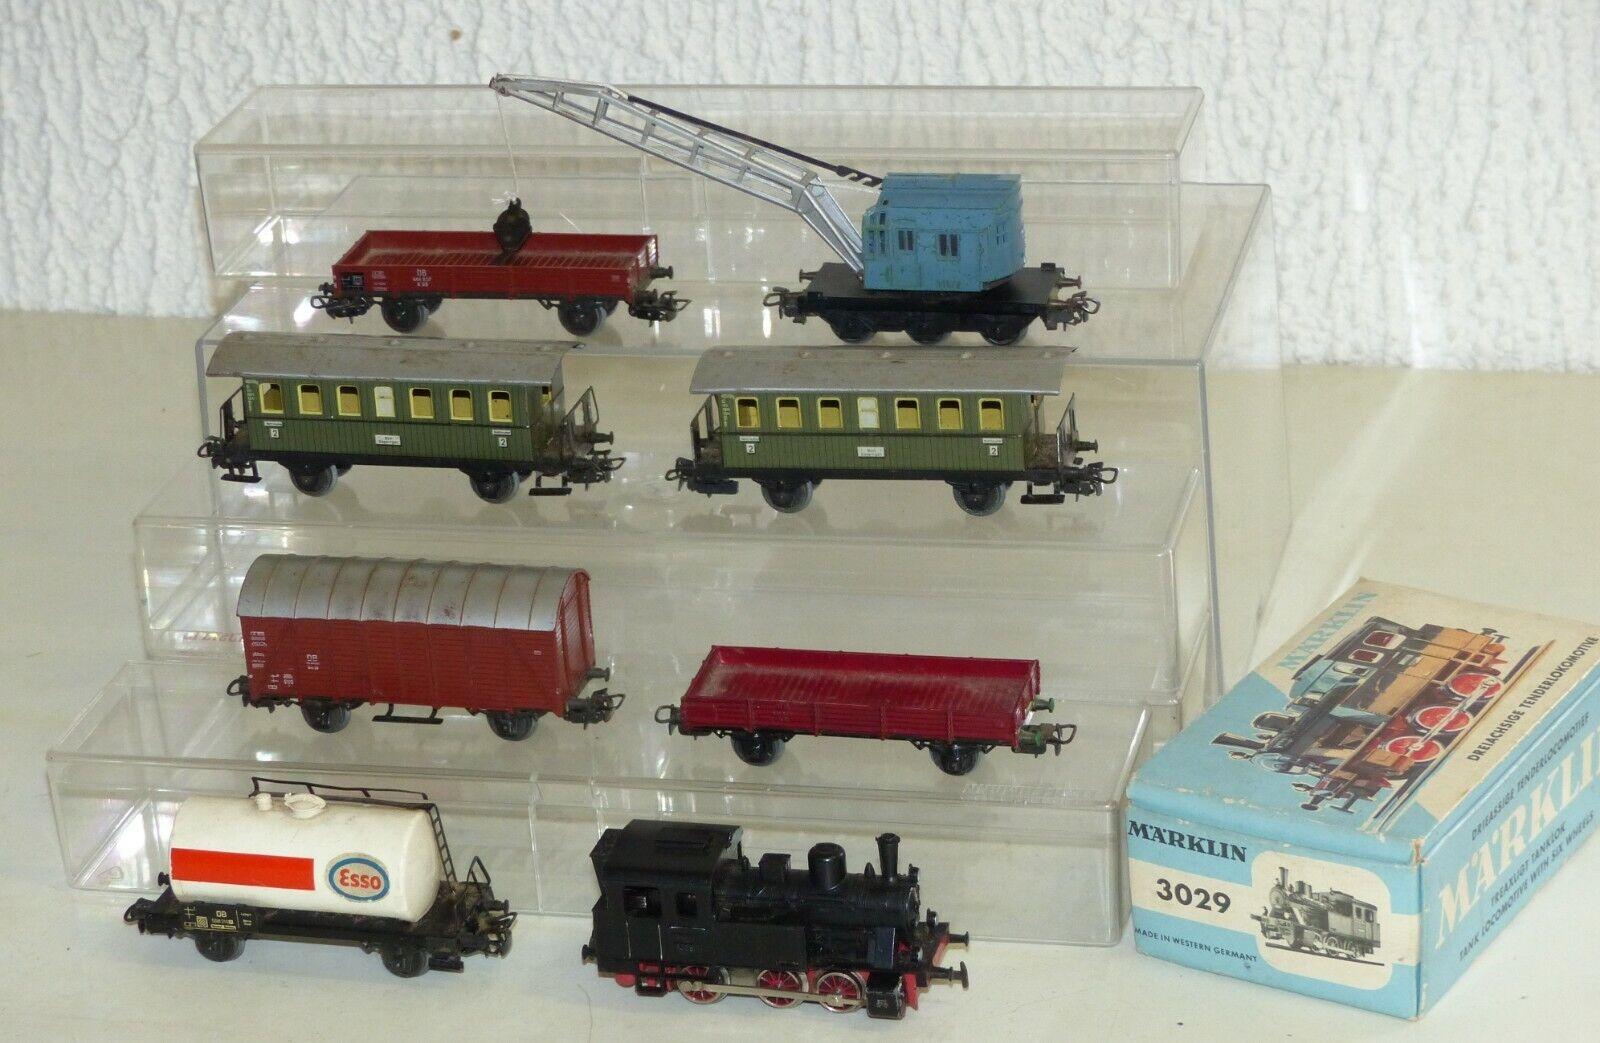 8x Märklin  3029 Dampflok, Güterwagen, Personenwagen, Kranwagen.. Spur 1 87 H0